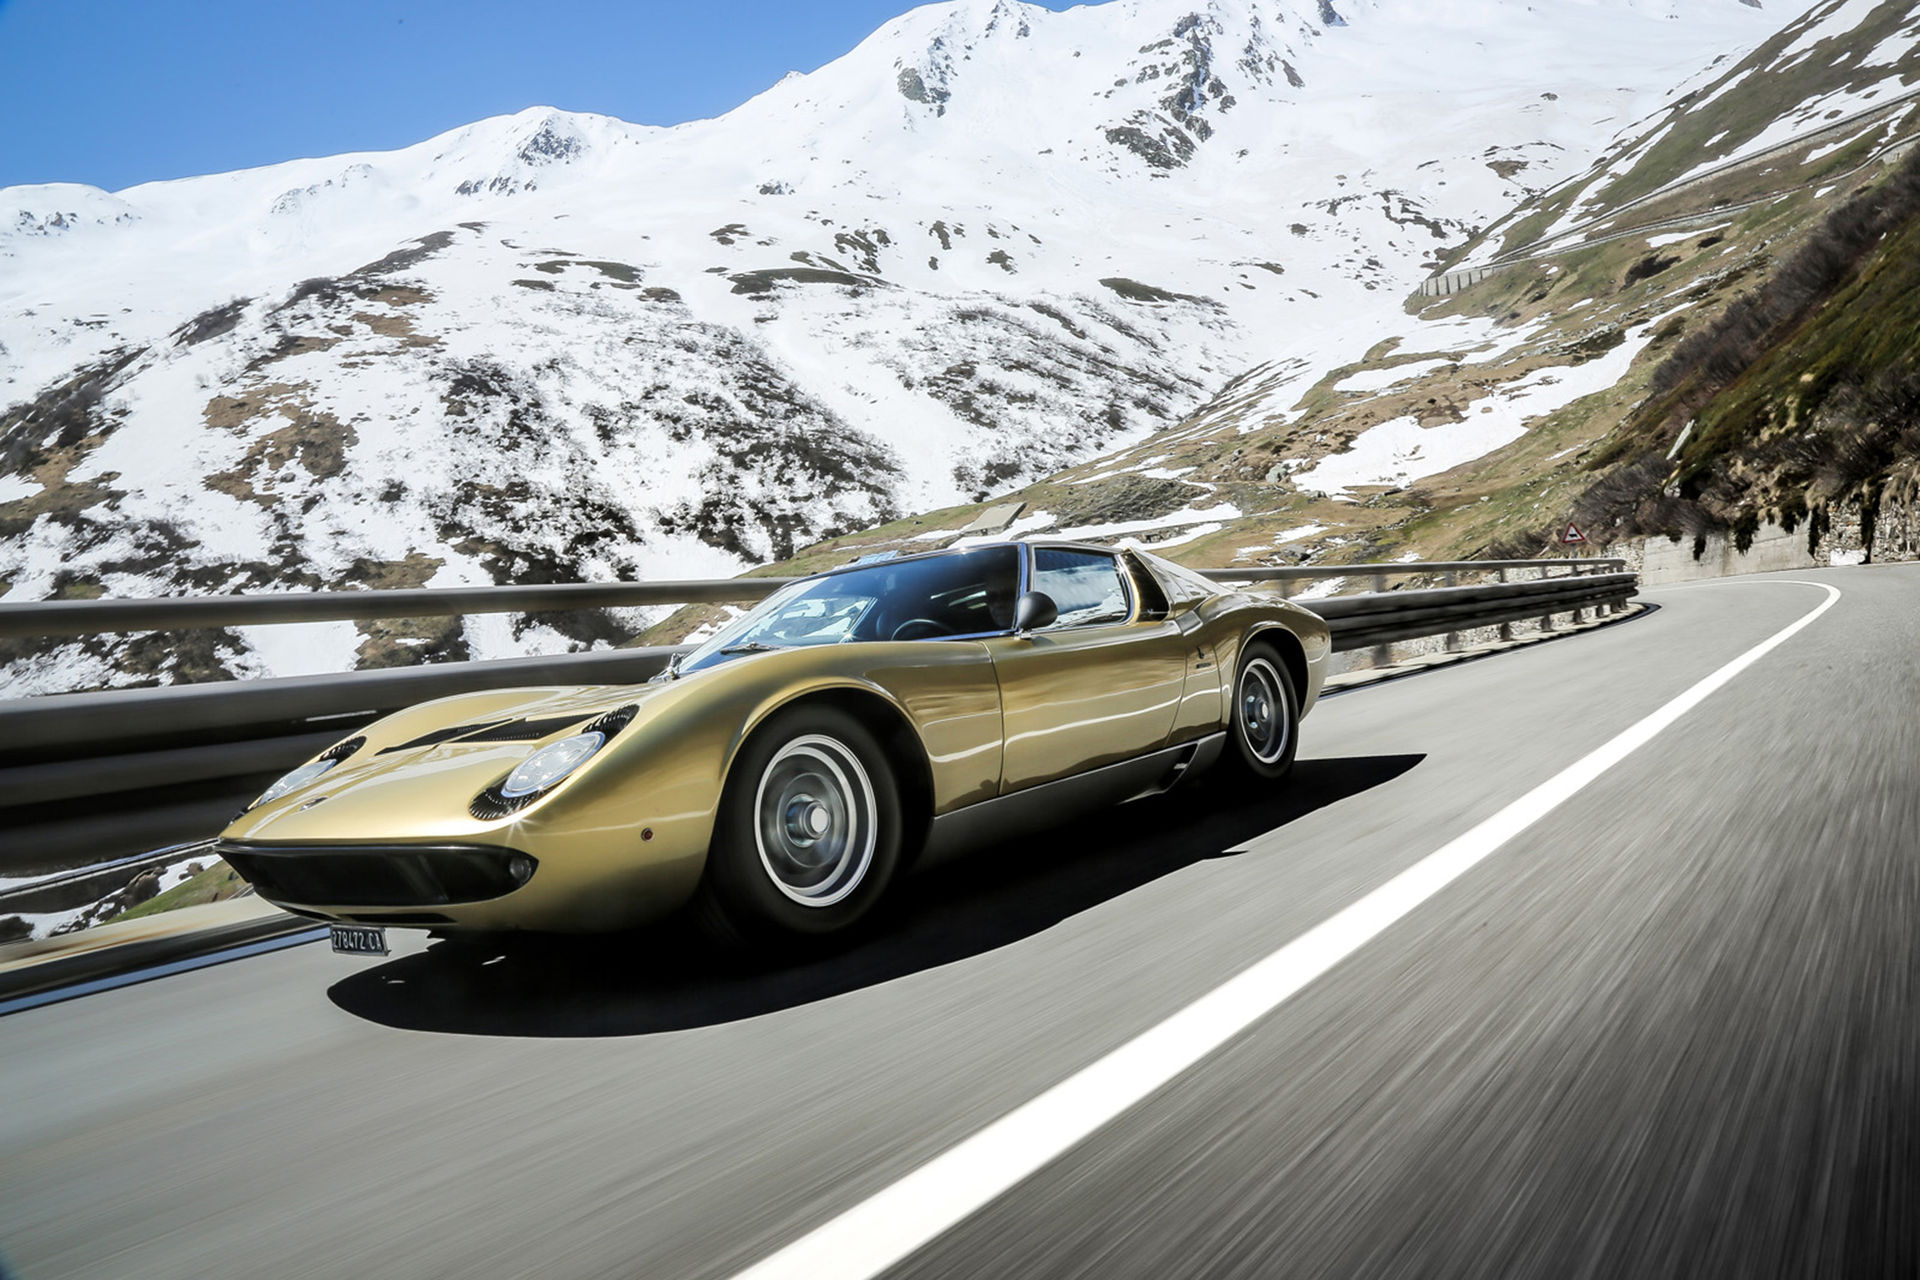 Lamborghini återskapar The Italian Job-scenen